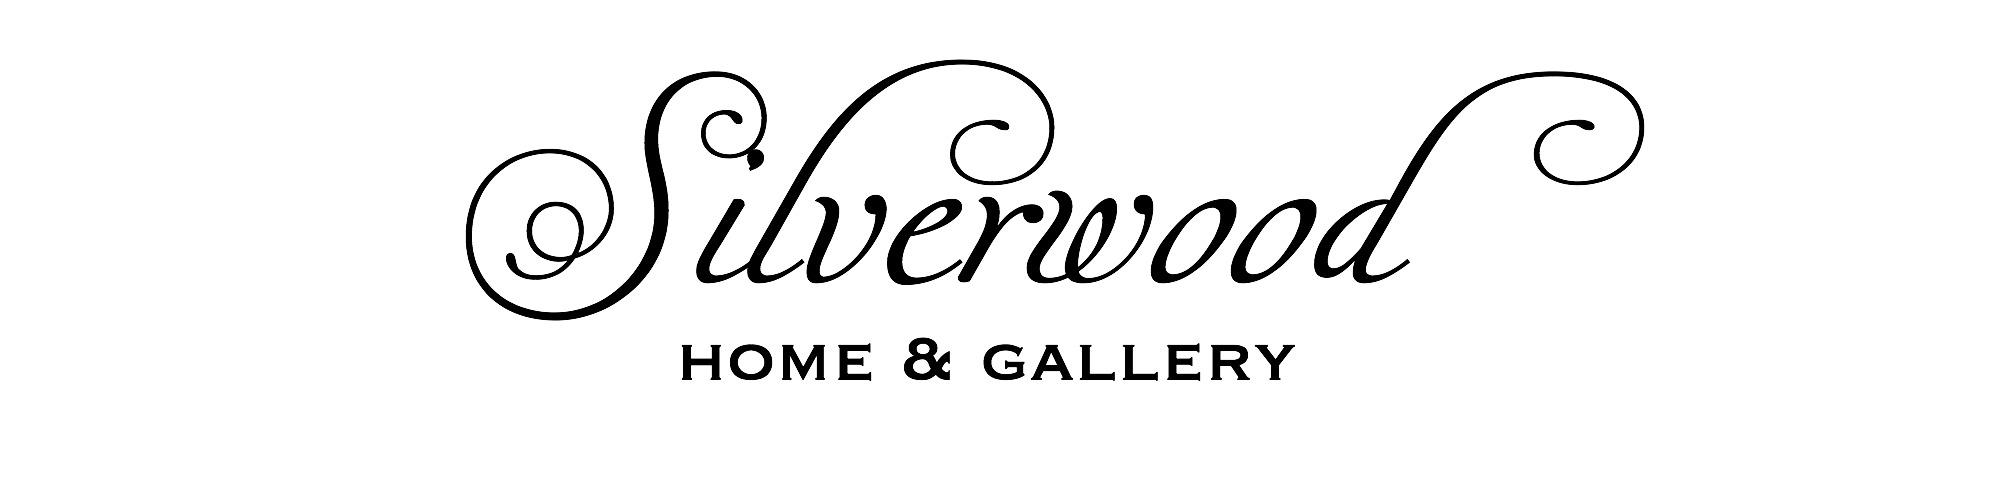 Silverwood